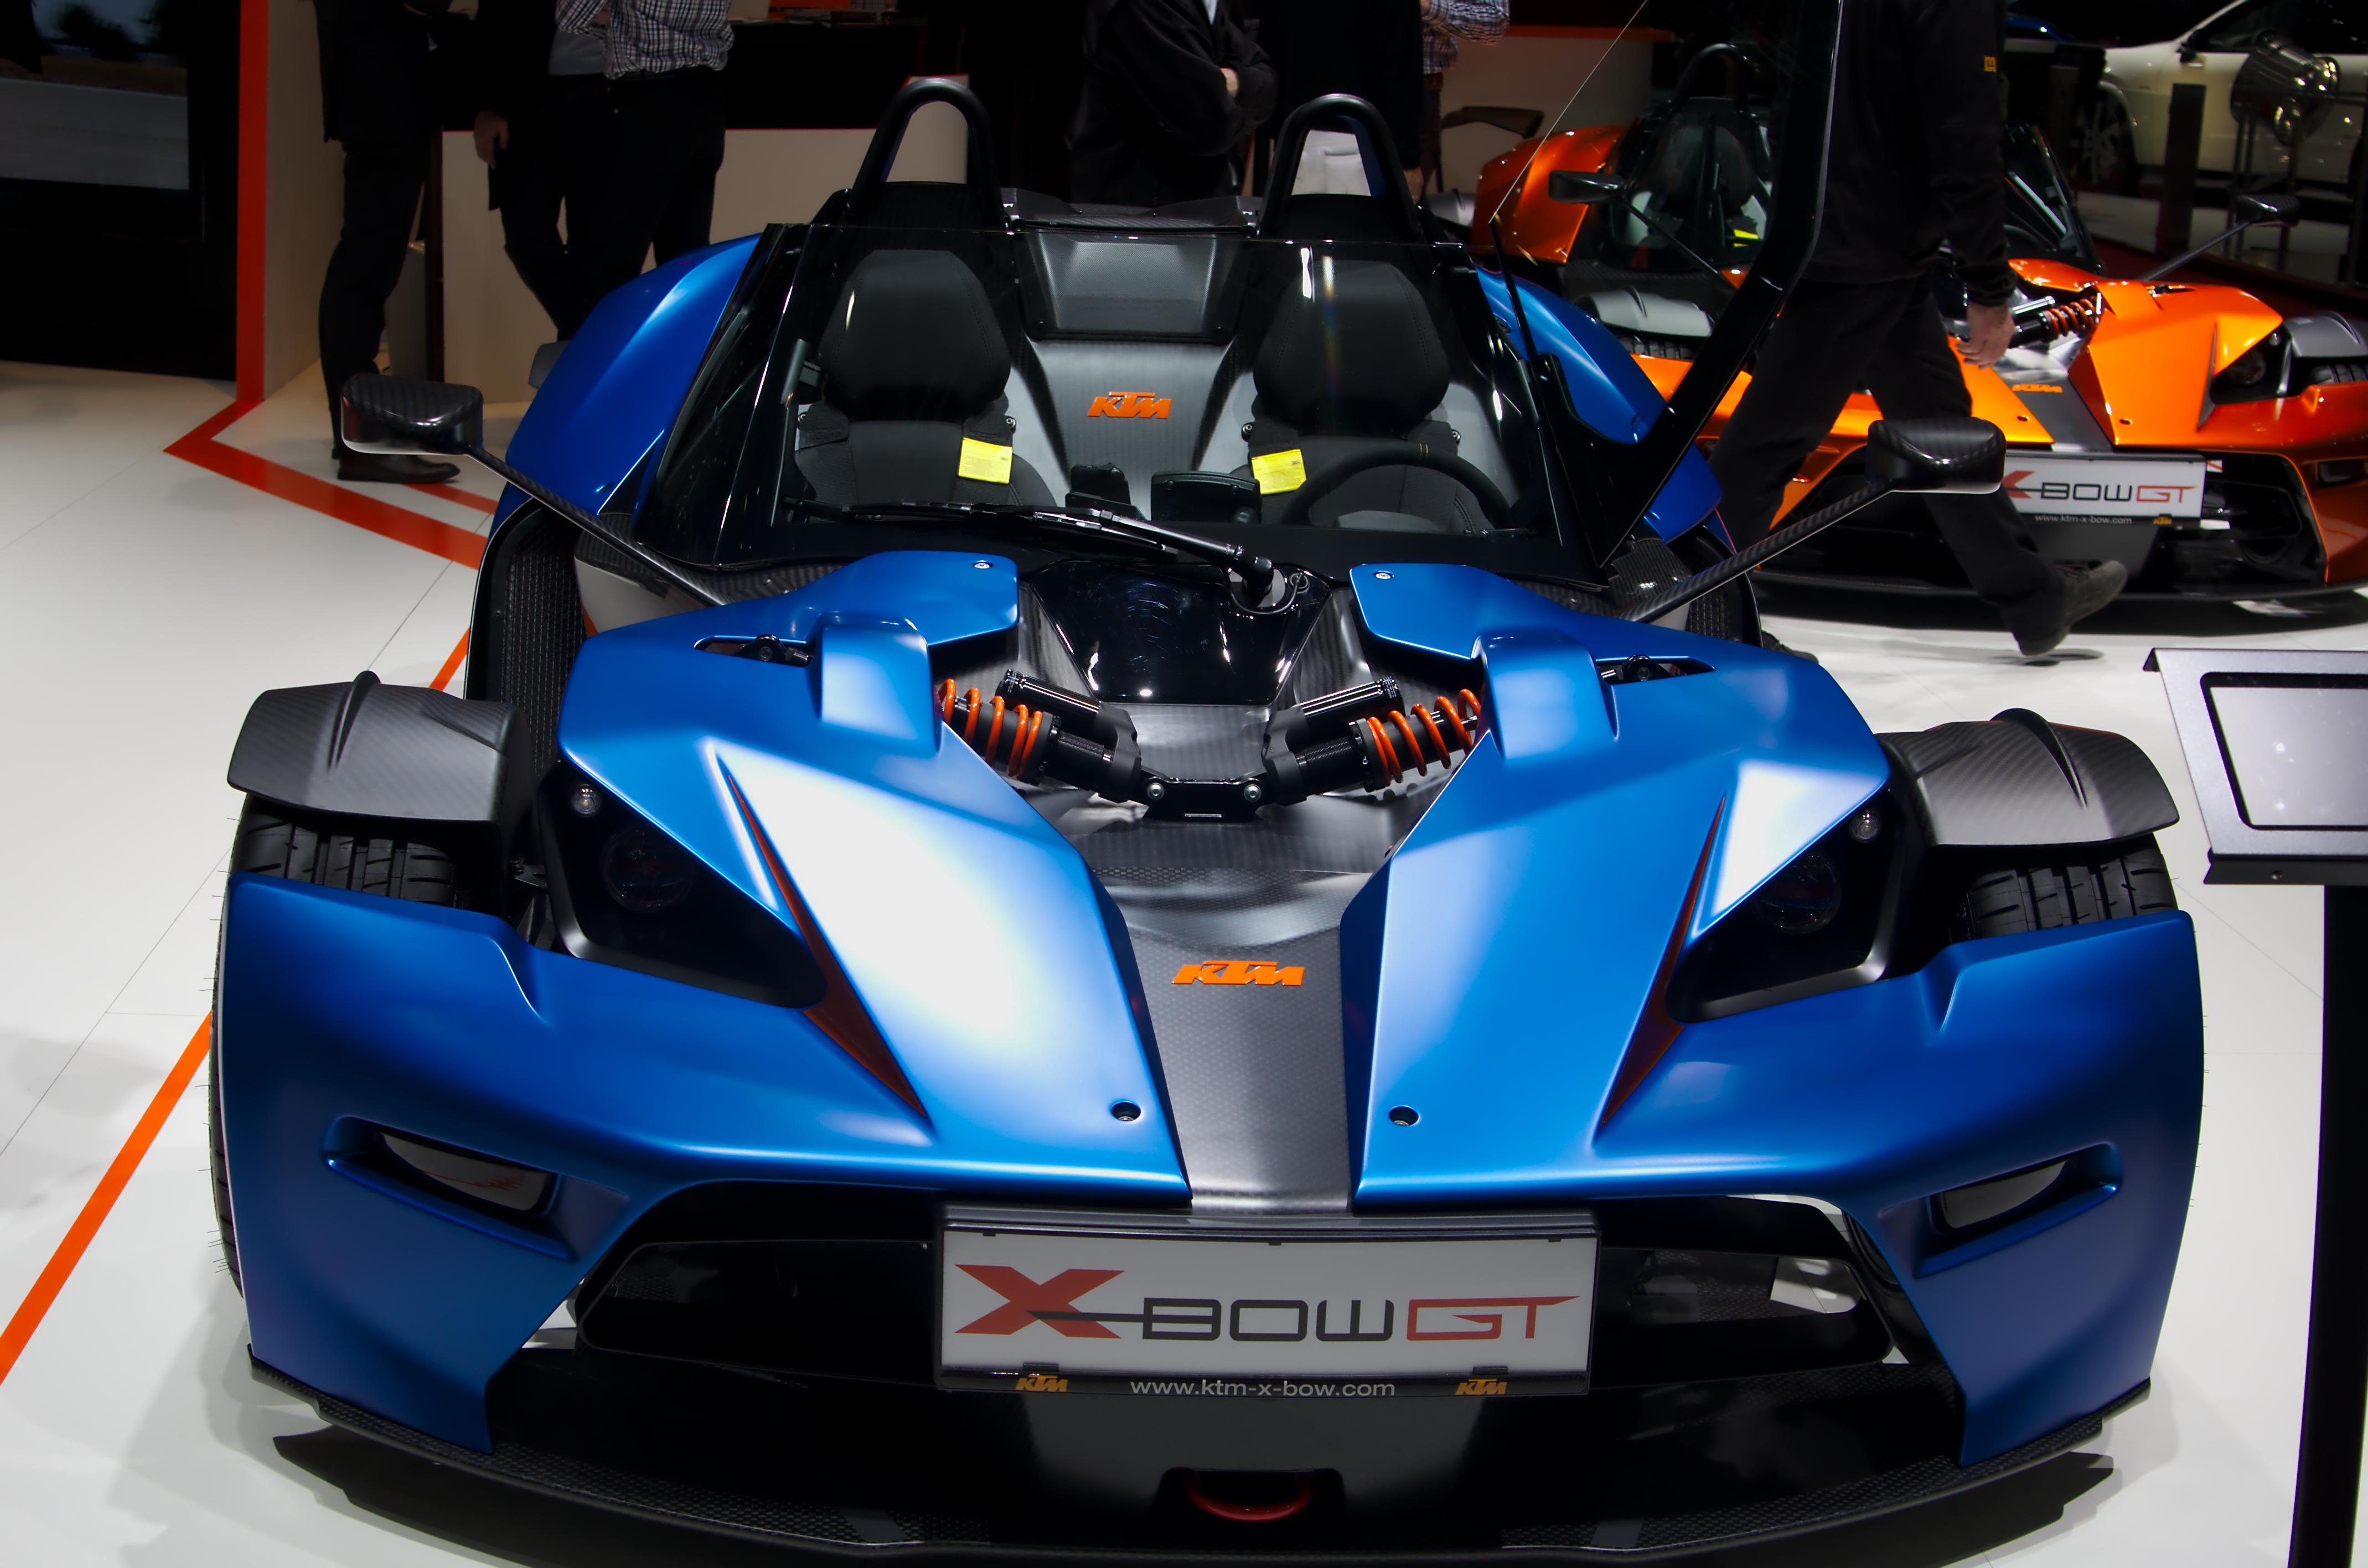 Ktm X Bow >> File:Geneva MotorShow 2013 - KTM X-bow GT blue front.jpg ...